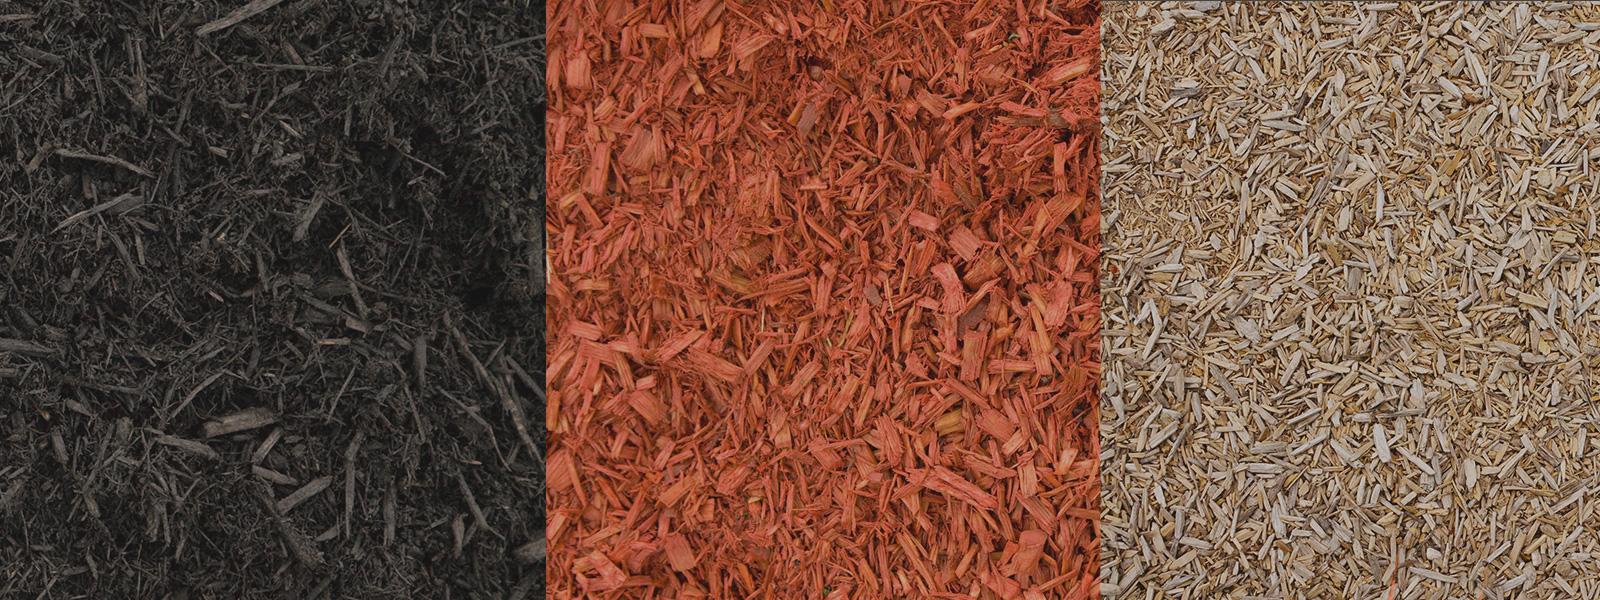 Black, Red & Beige Mulch